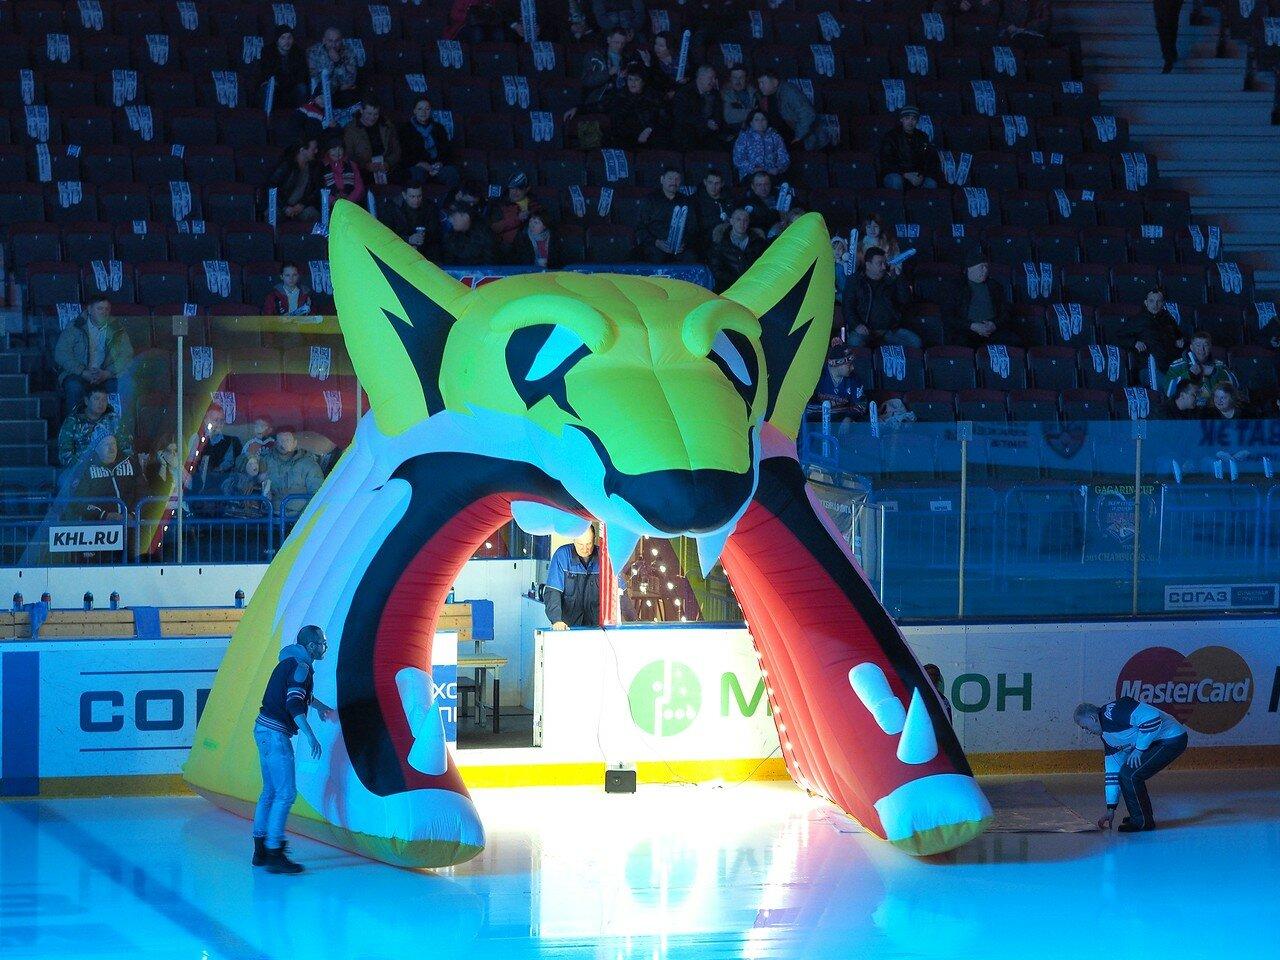 52Плей-офф 2016 Восток Финал Металлург - Салават Юлаев 23.03.2016